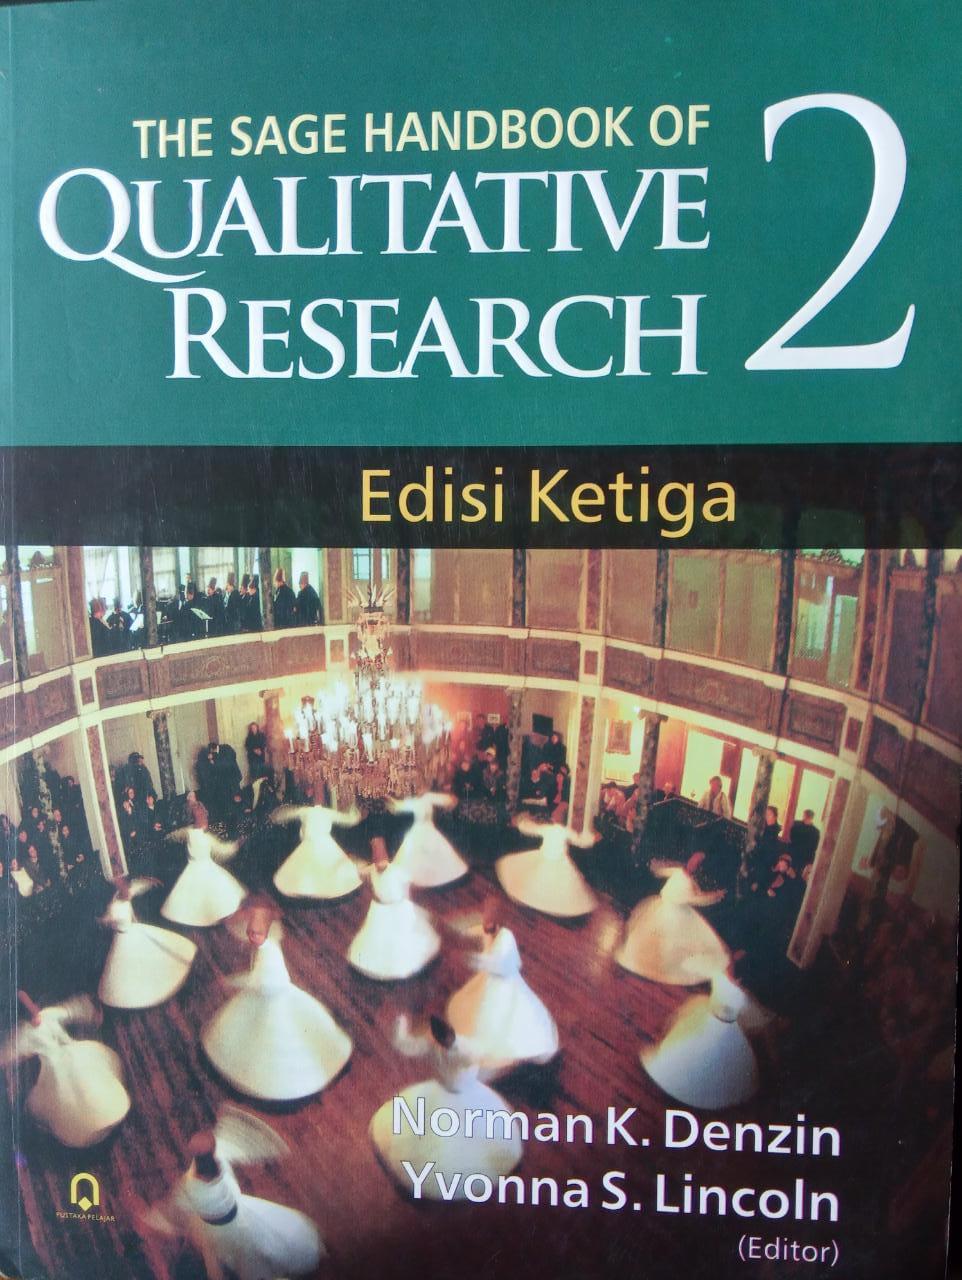 THE SAGE HANDBOOK OF QUALITATIVE RESEARCH 2